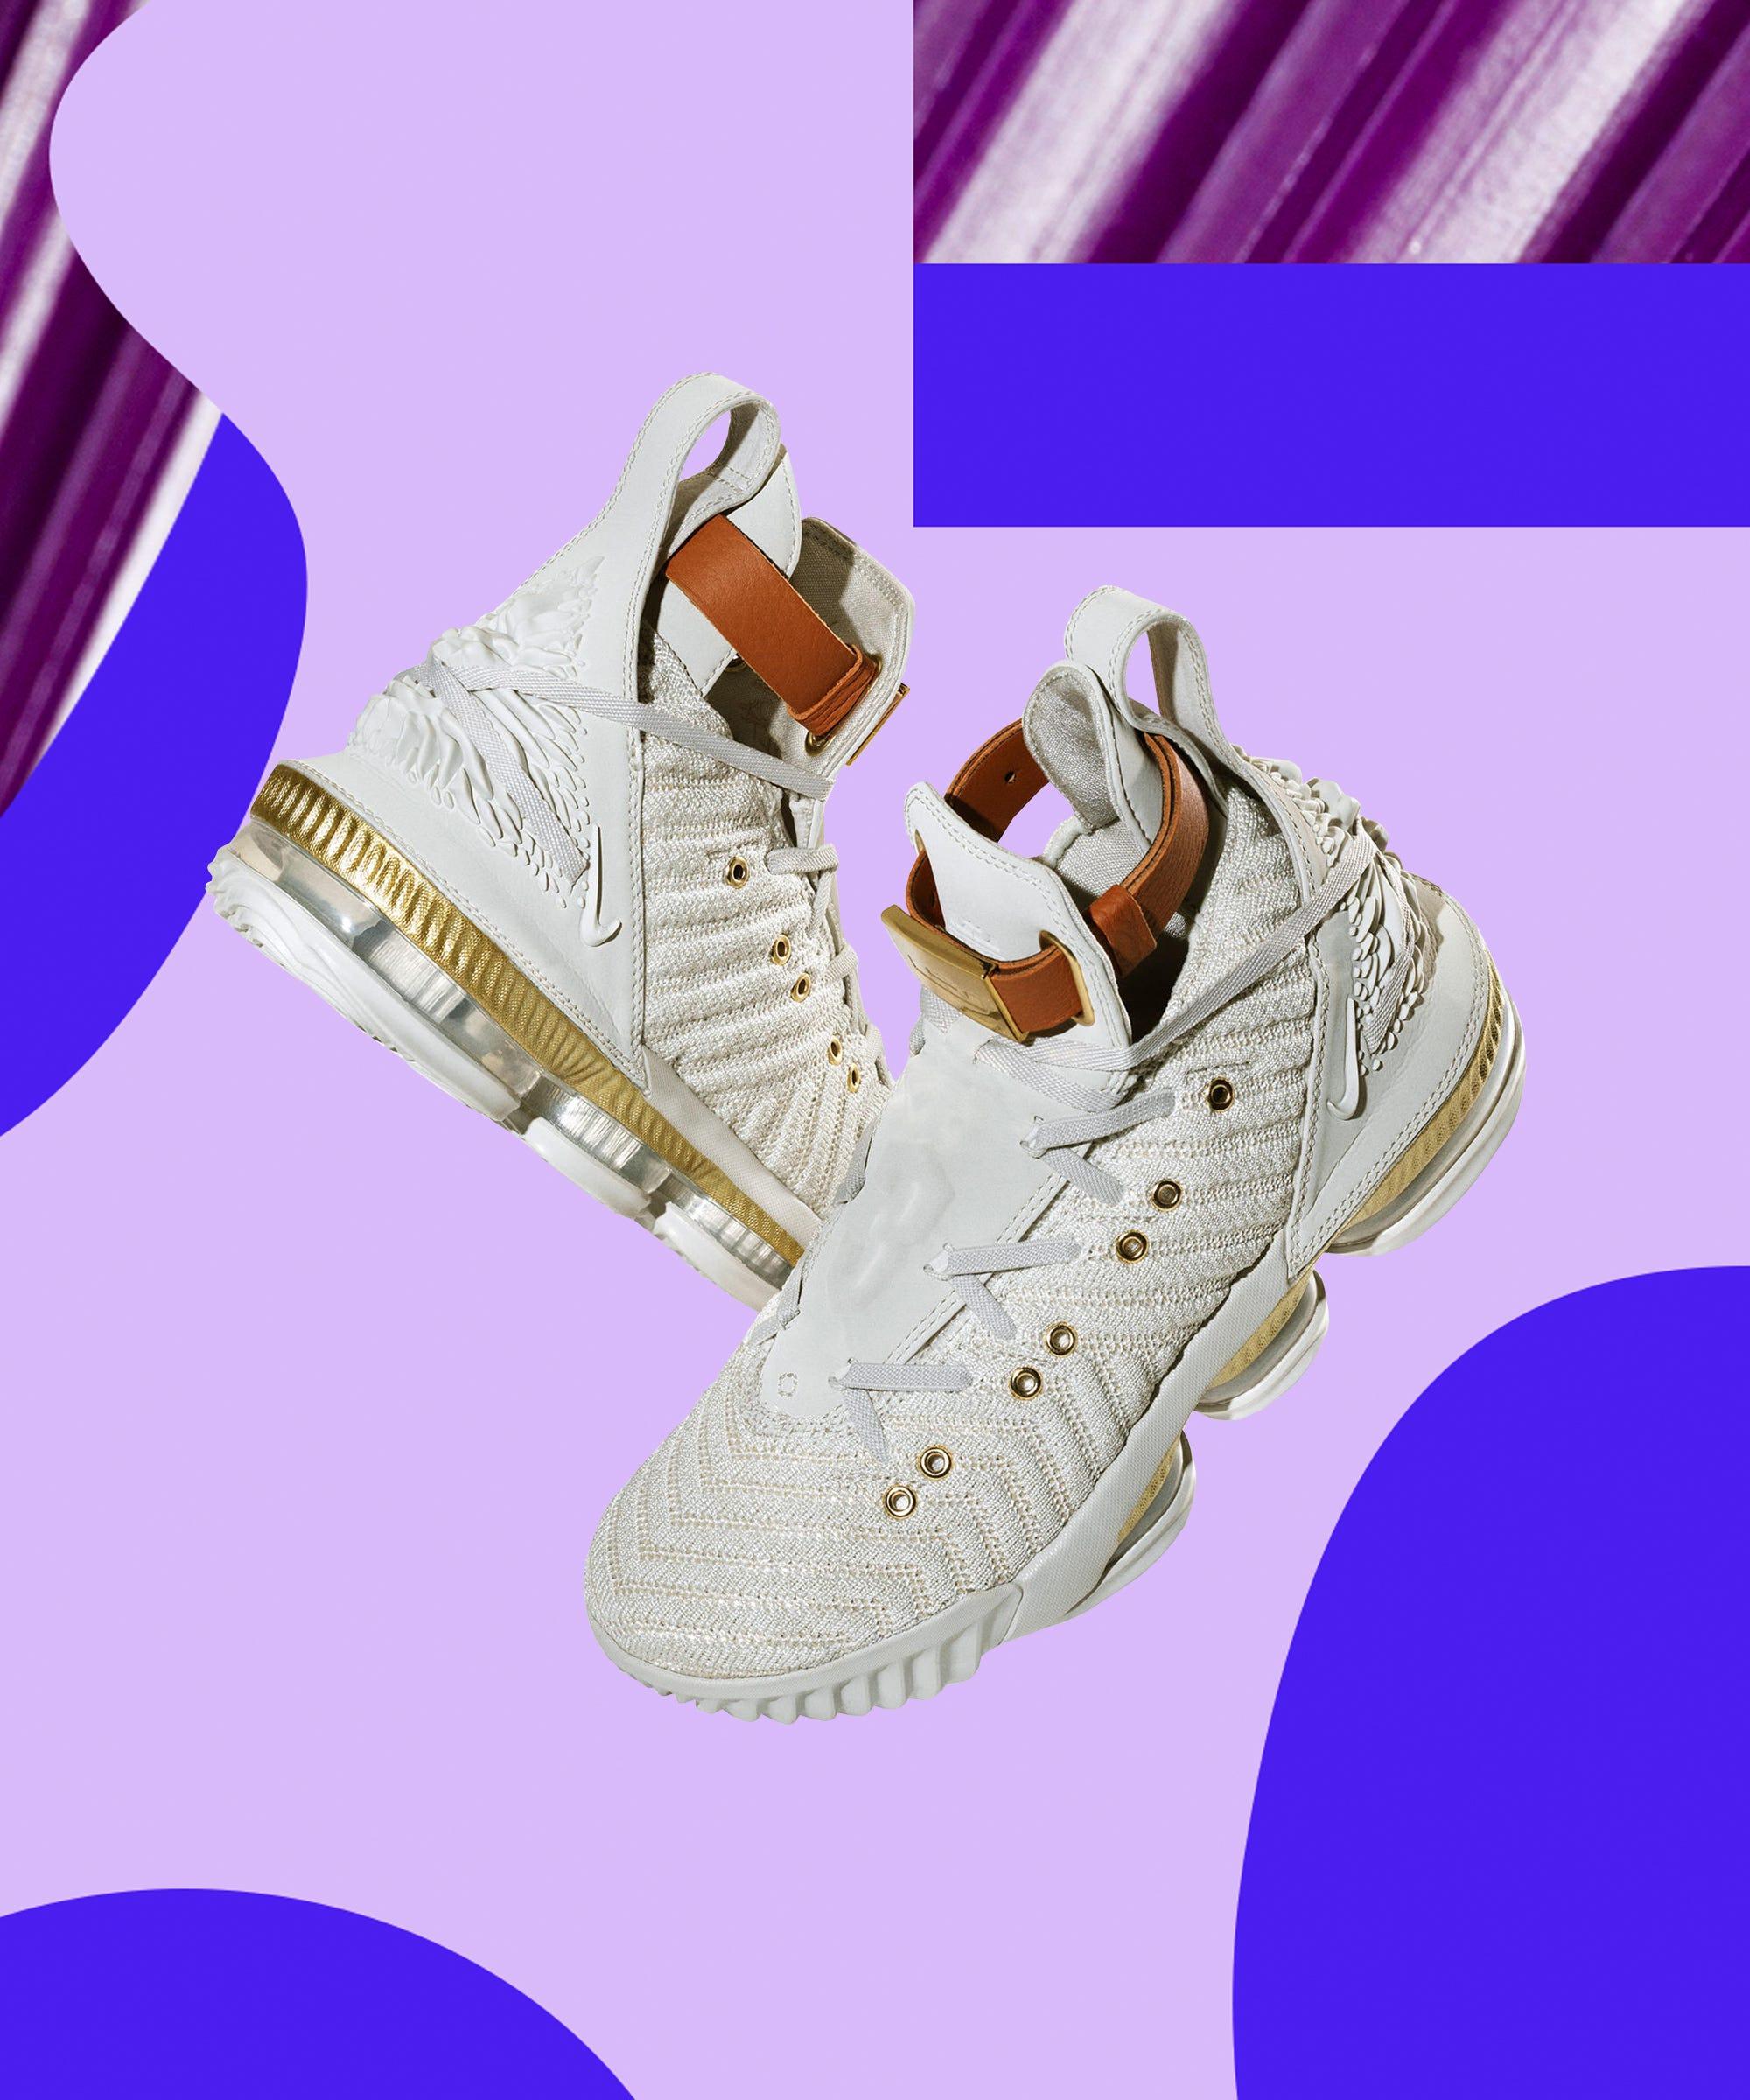 sale retailer 92e22 e5c66 How To Shop LeBron James First Female Designed Sneaker